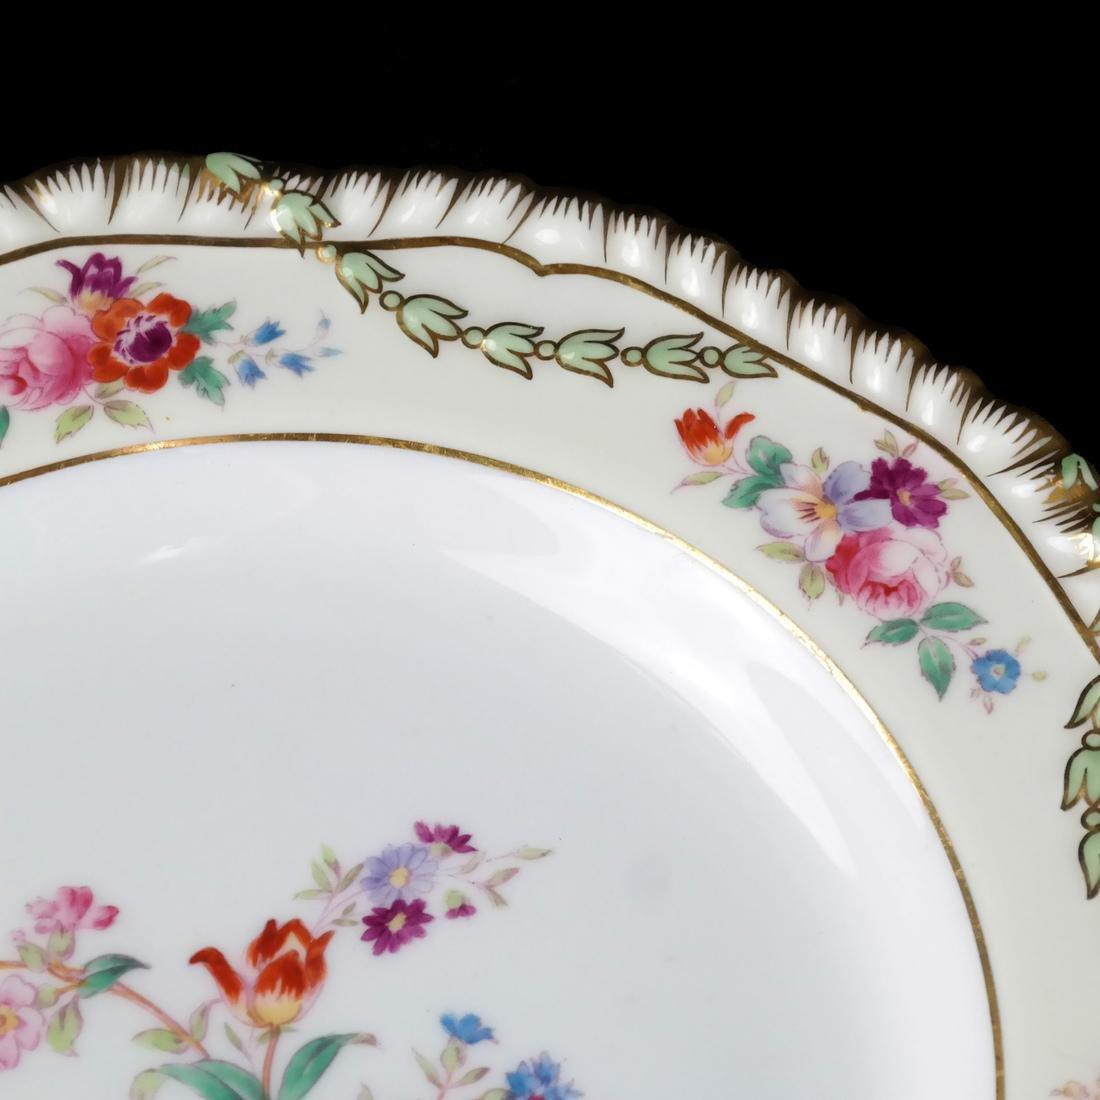 12 Wedgwood Porcelain Luncheon Plates - 4